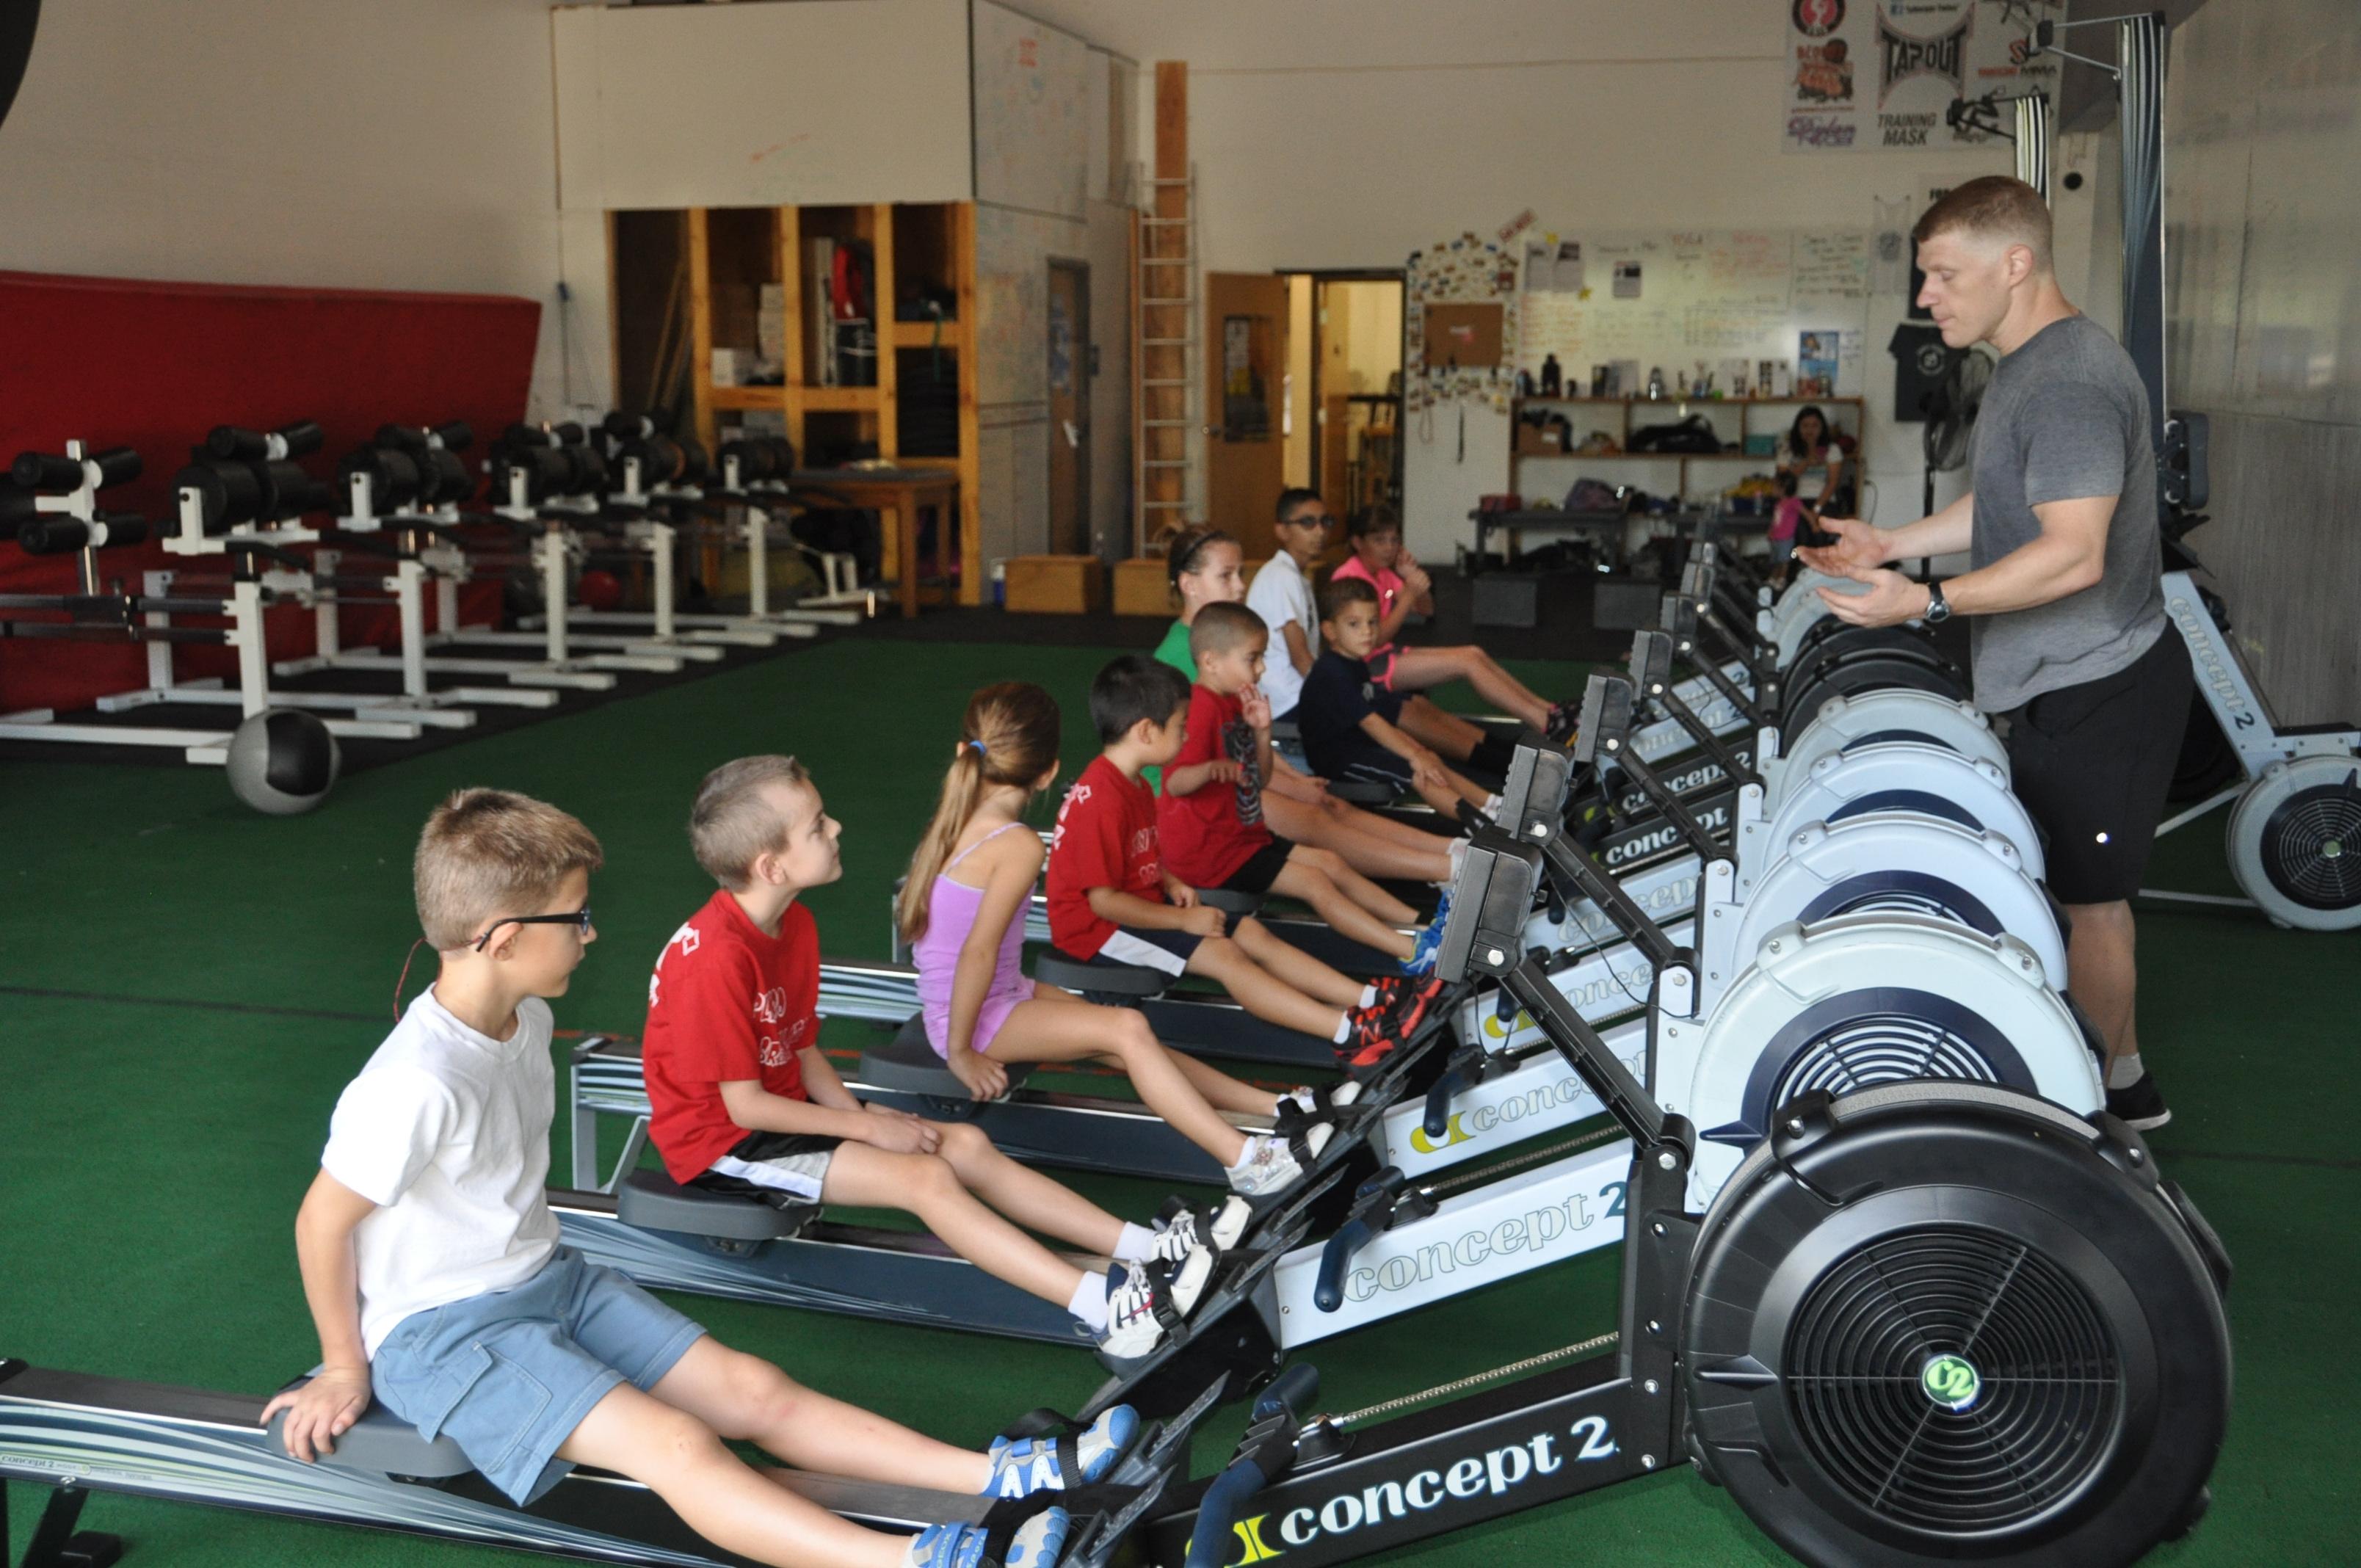 CrossFit Kids: Building the Future